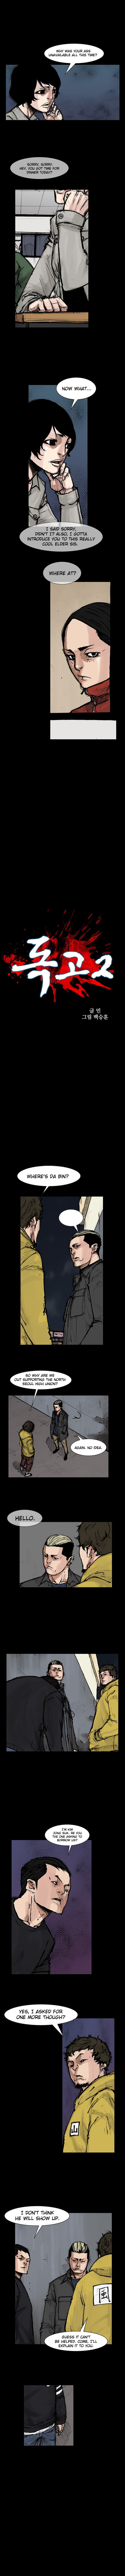 https://img2.nineanime.com/comics/pic1/15/20623/550622/41ab32a8ee30c68af11c6e320db4f5d0.jpg Page 1